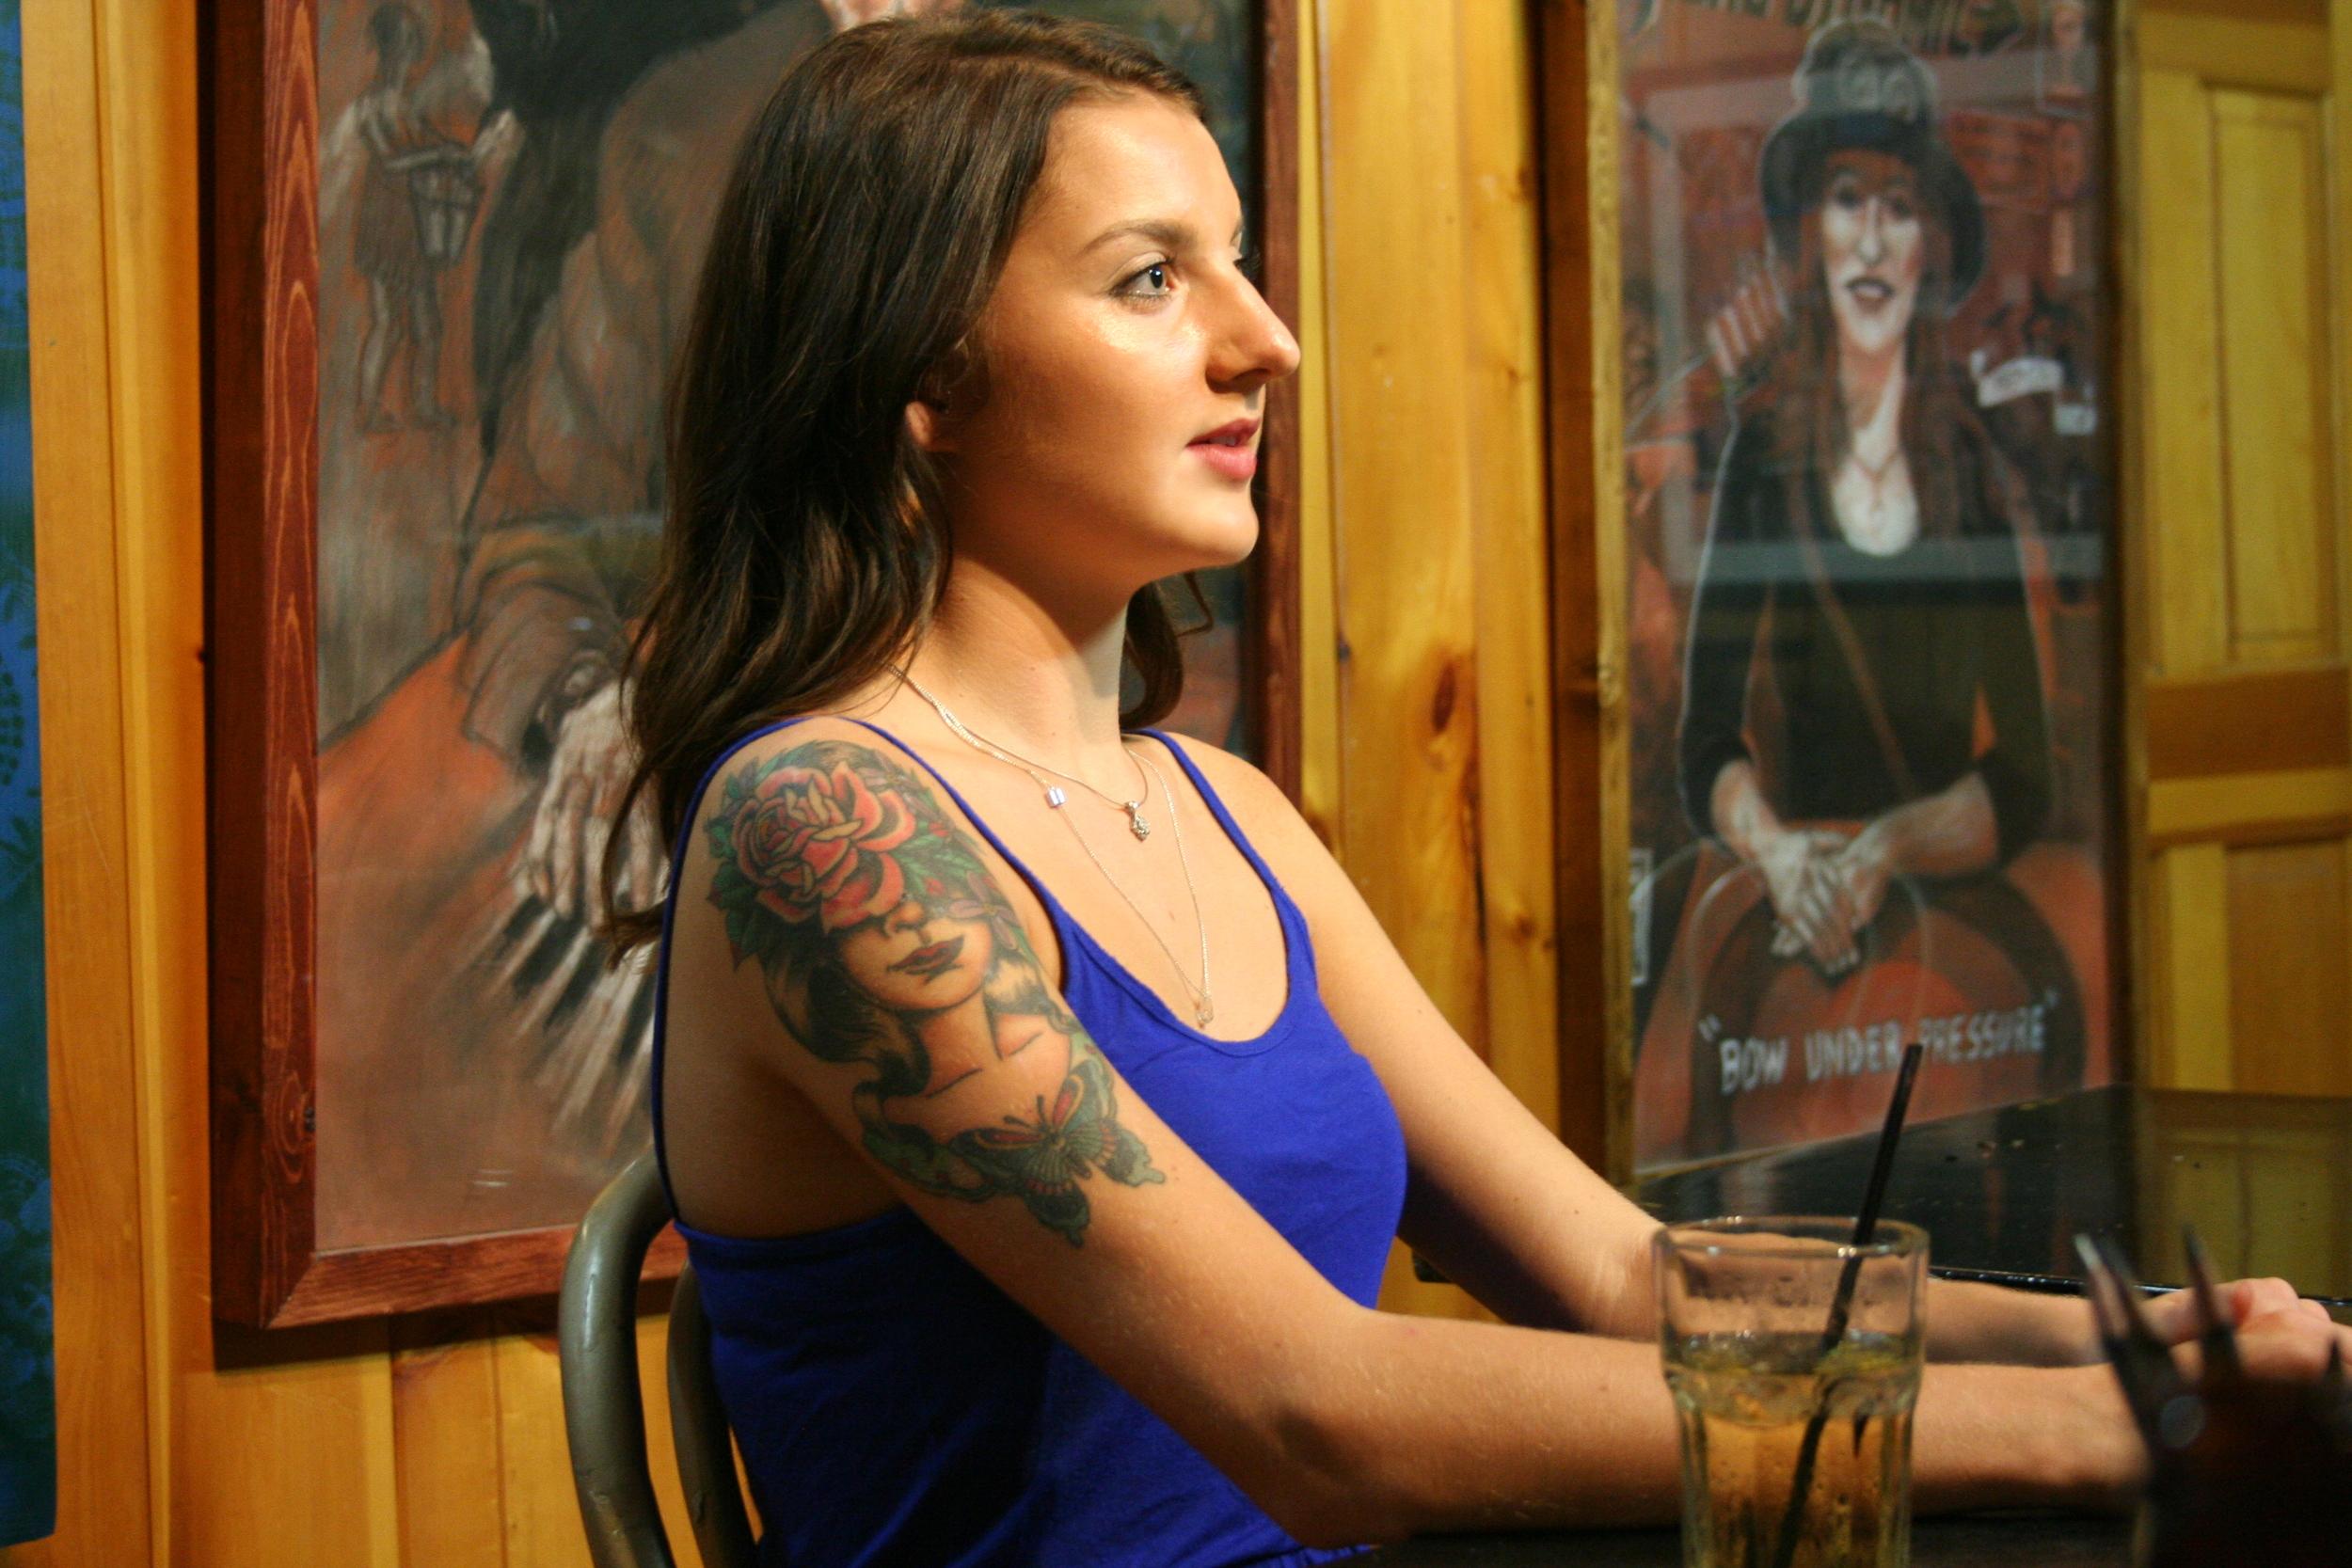 Profile of Erin.